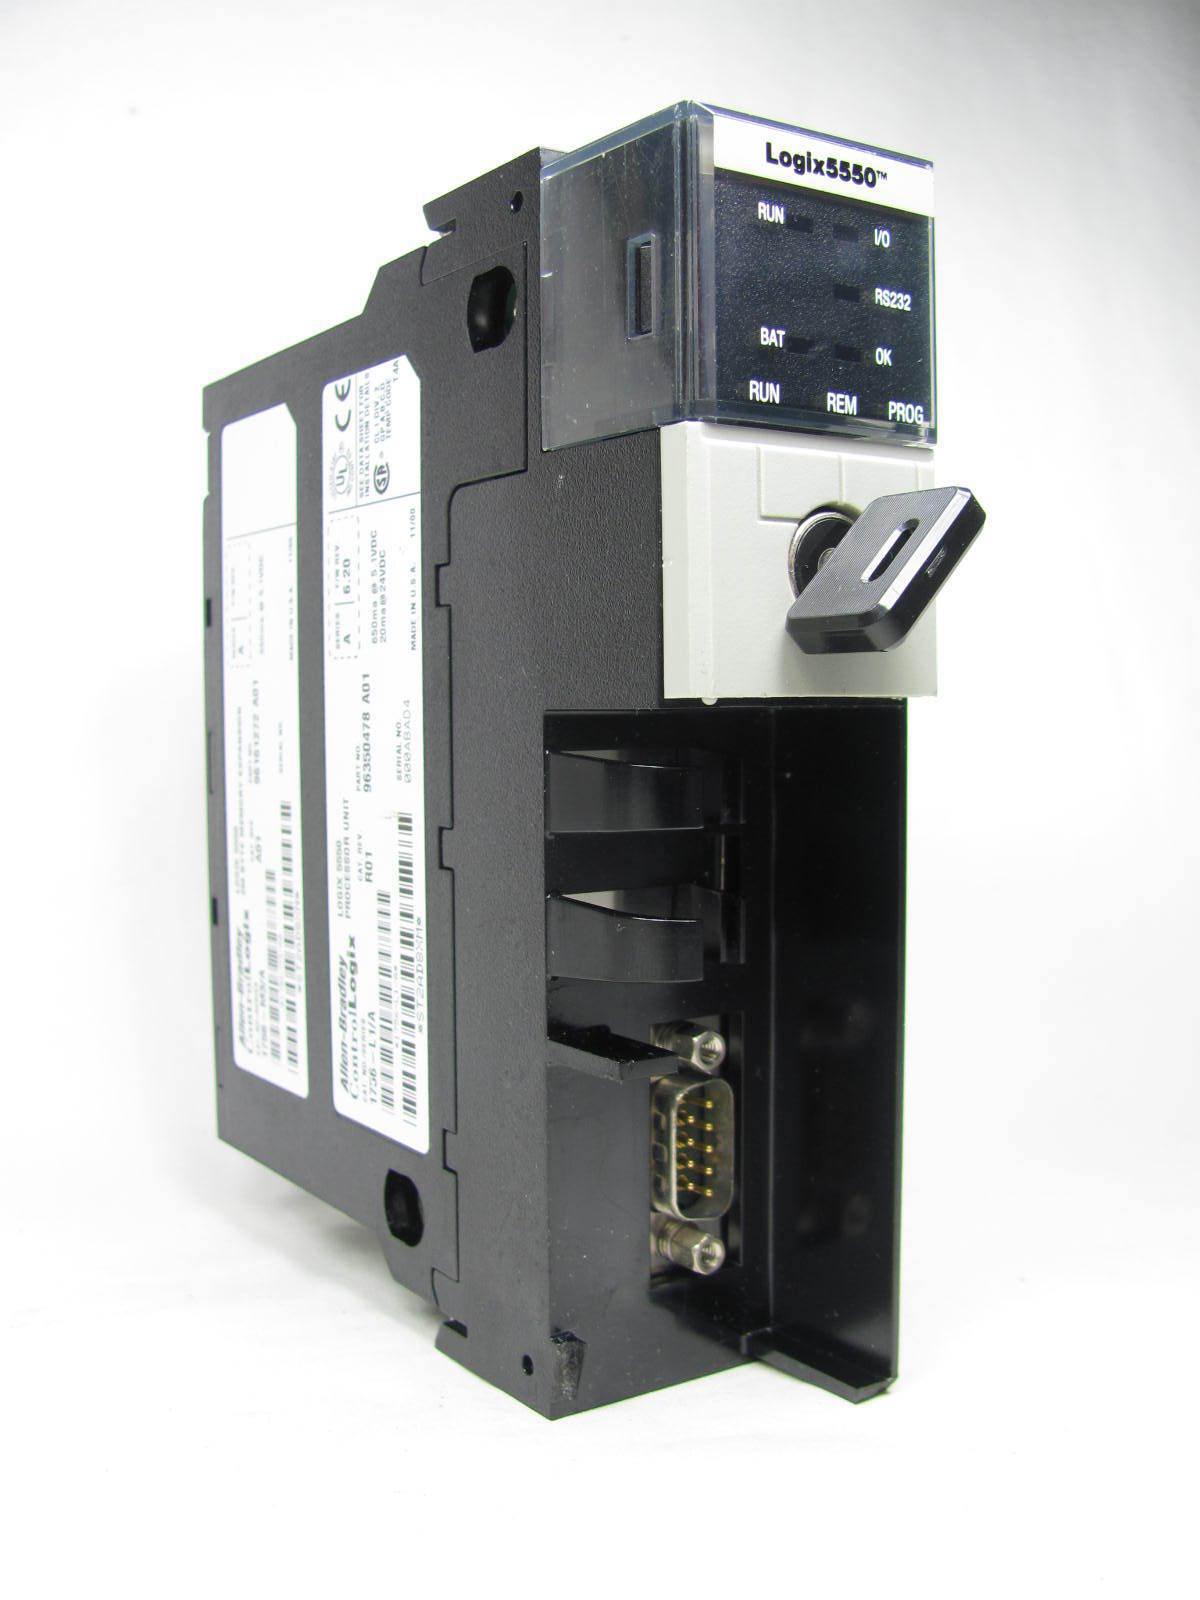 Allen Bradley 1756-L61 Processor